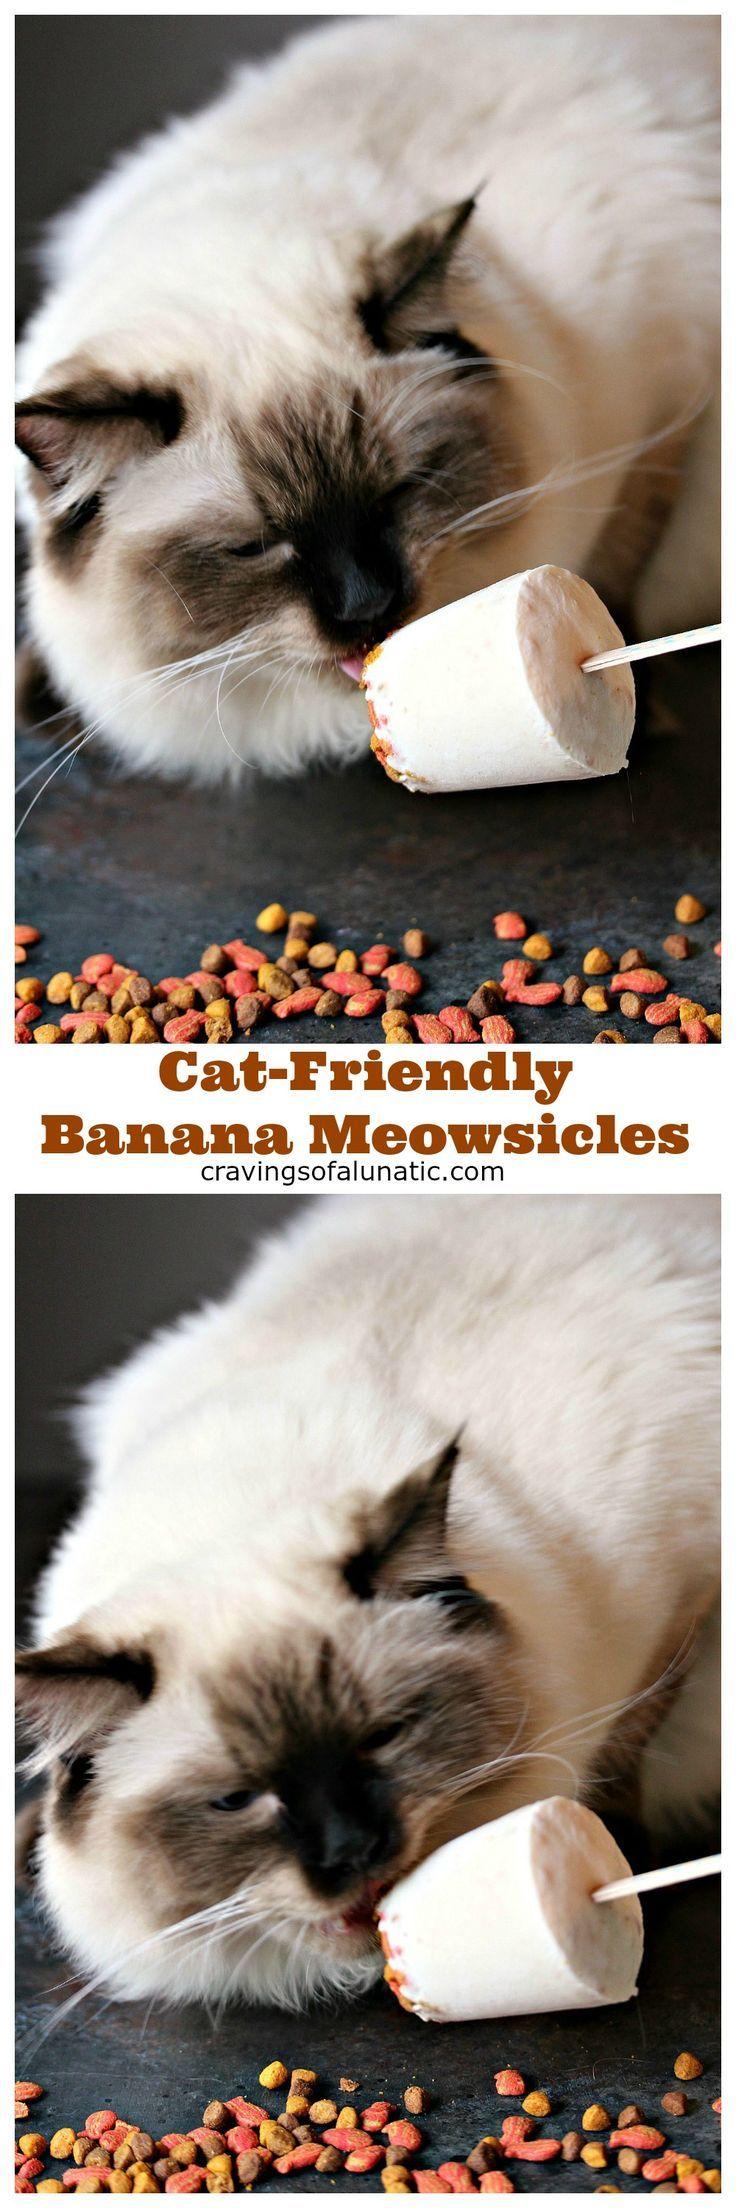 Cat-Friendly Banana Meowsicles from http://cravingsofalunatic.com- These refreshing…